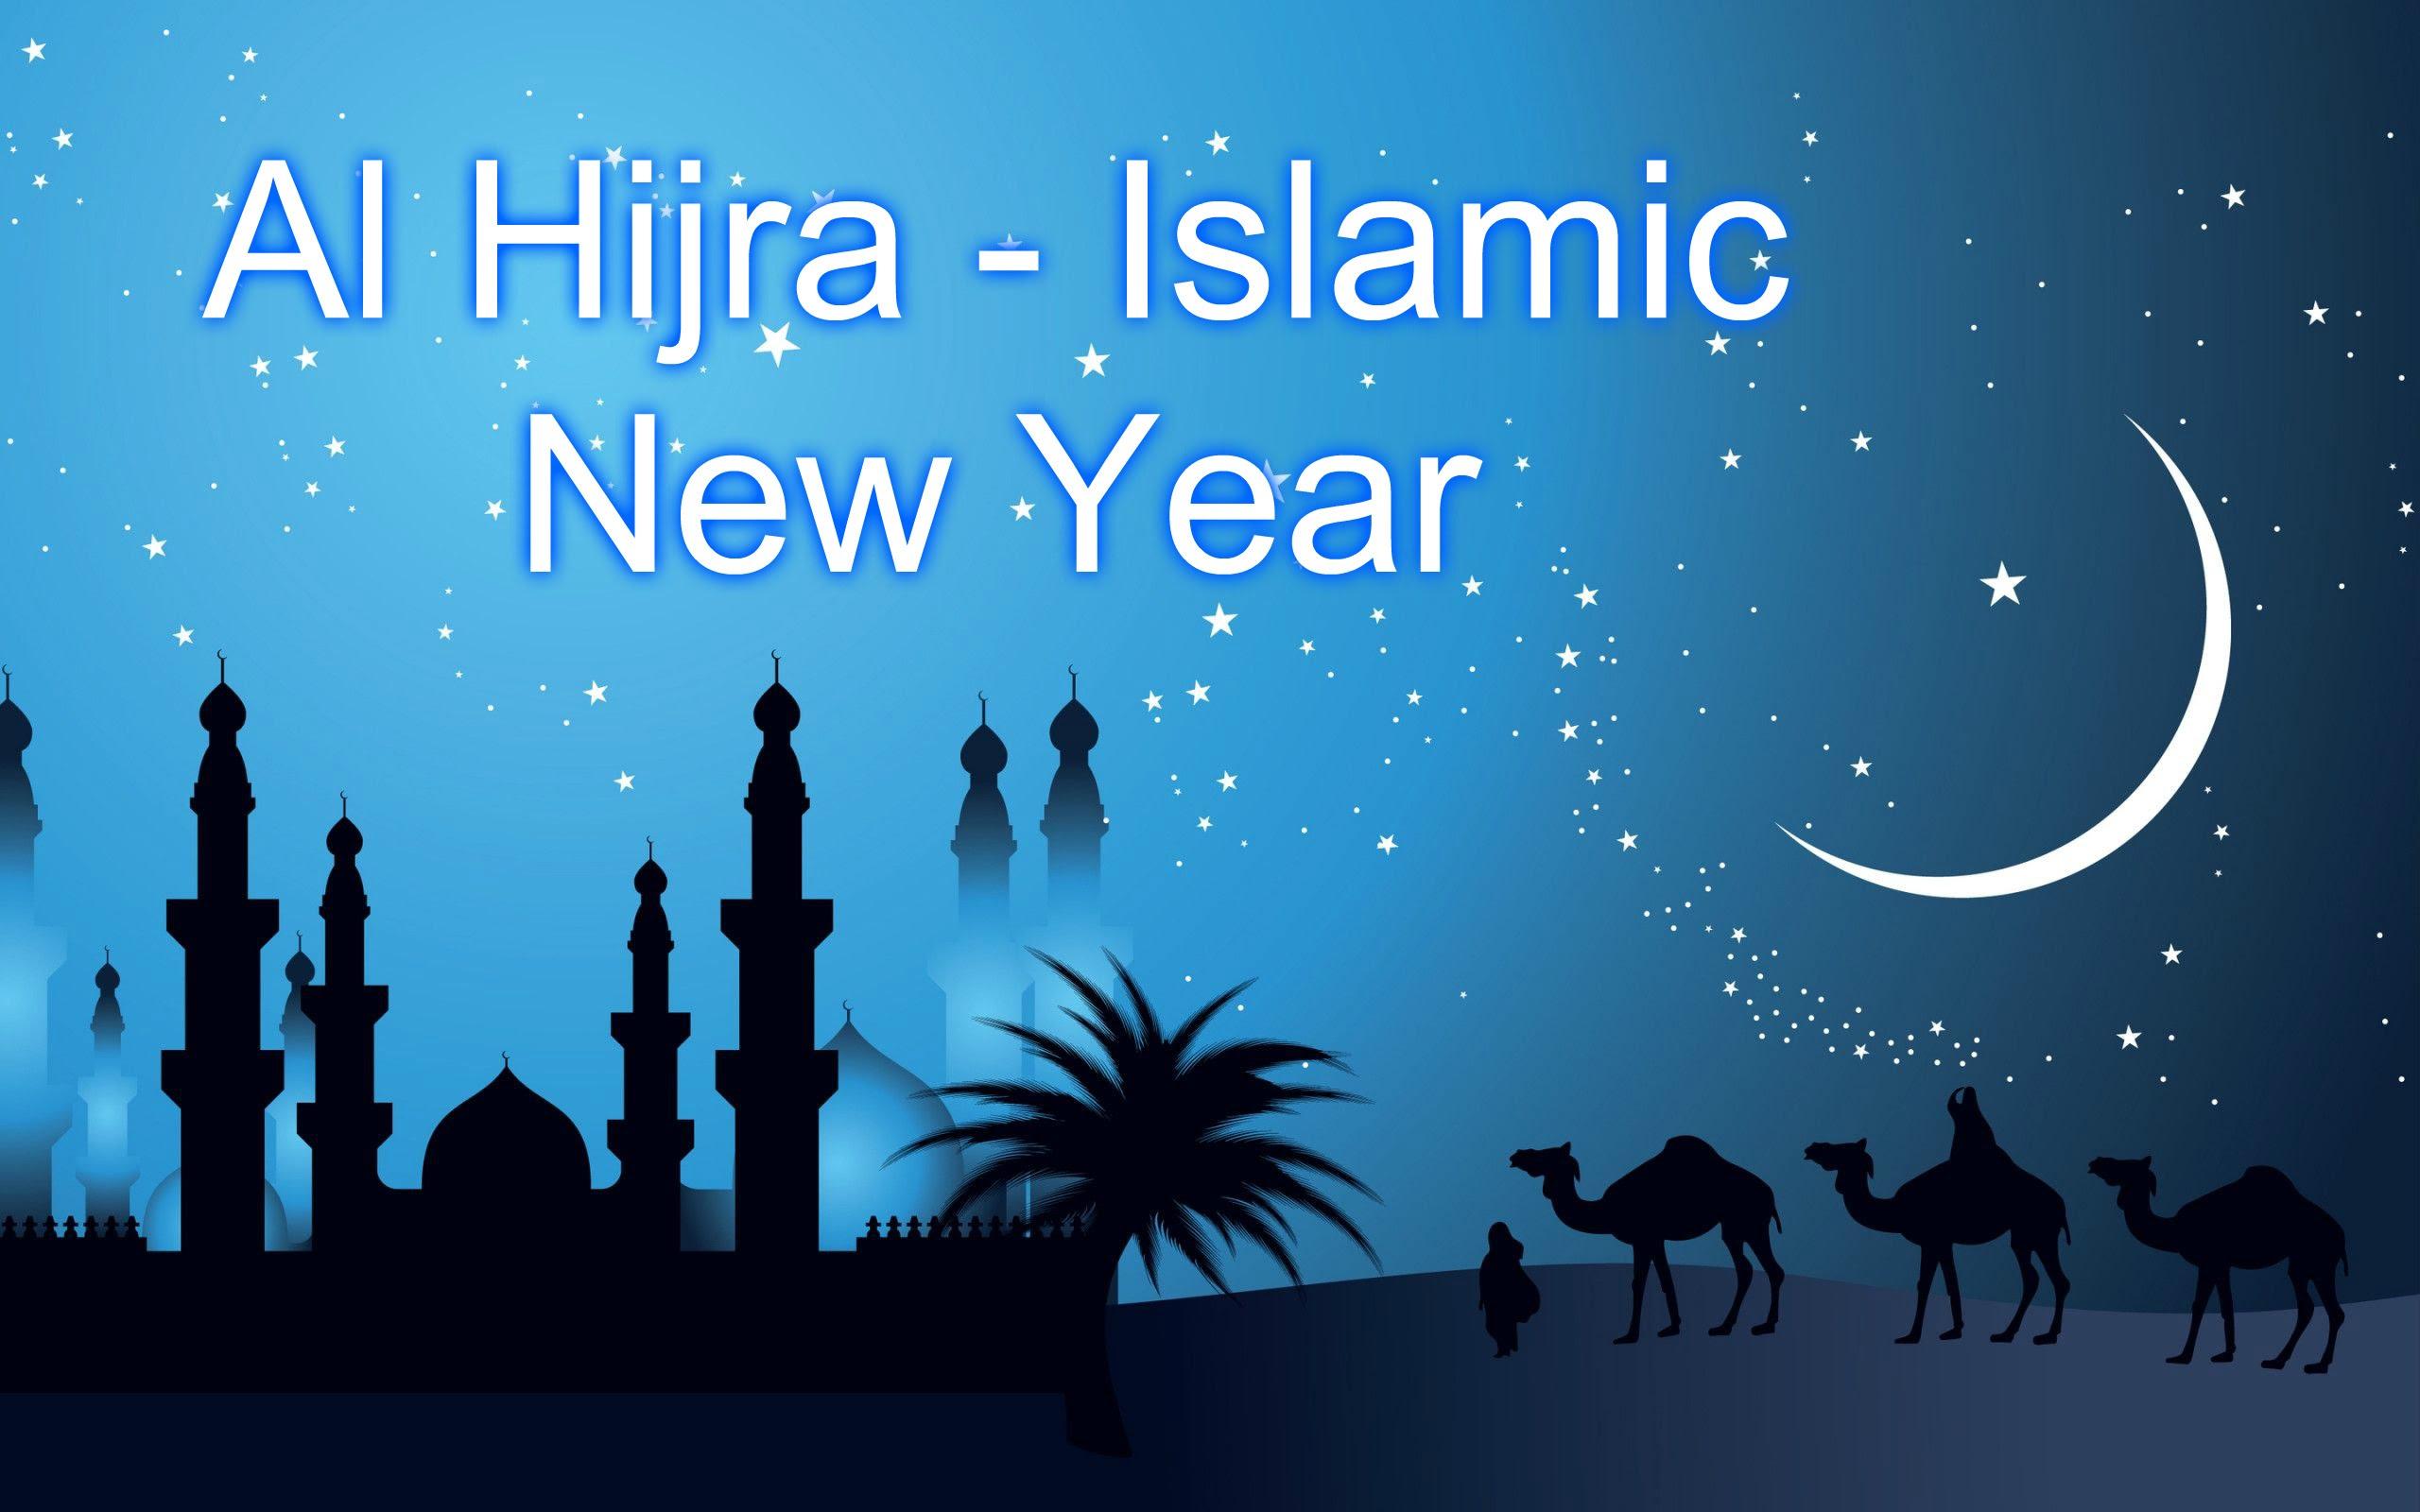 Islamic New Year 2019: Hijri New Year Date, Significance, Celebration, Wishes & Images